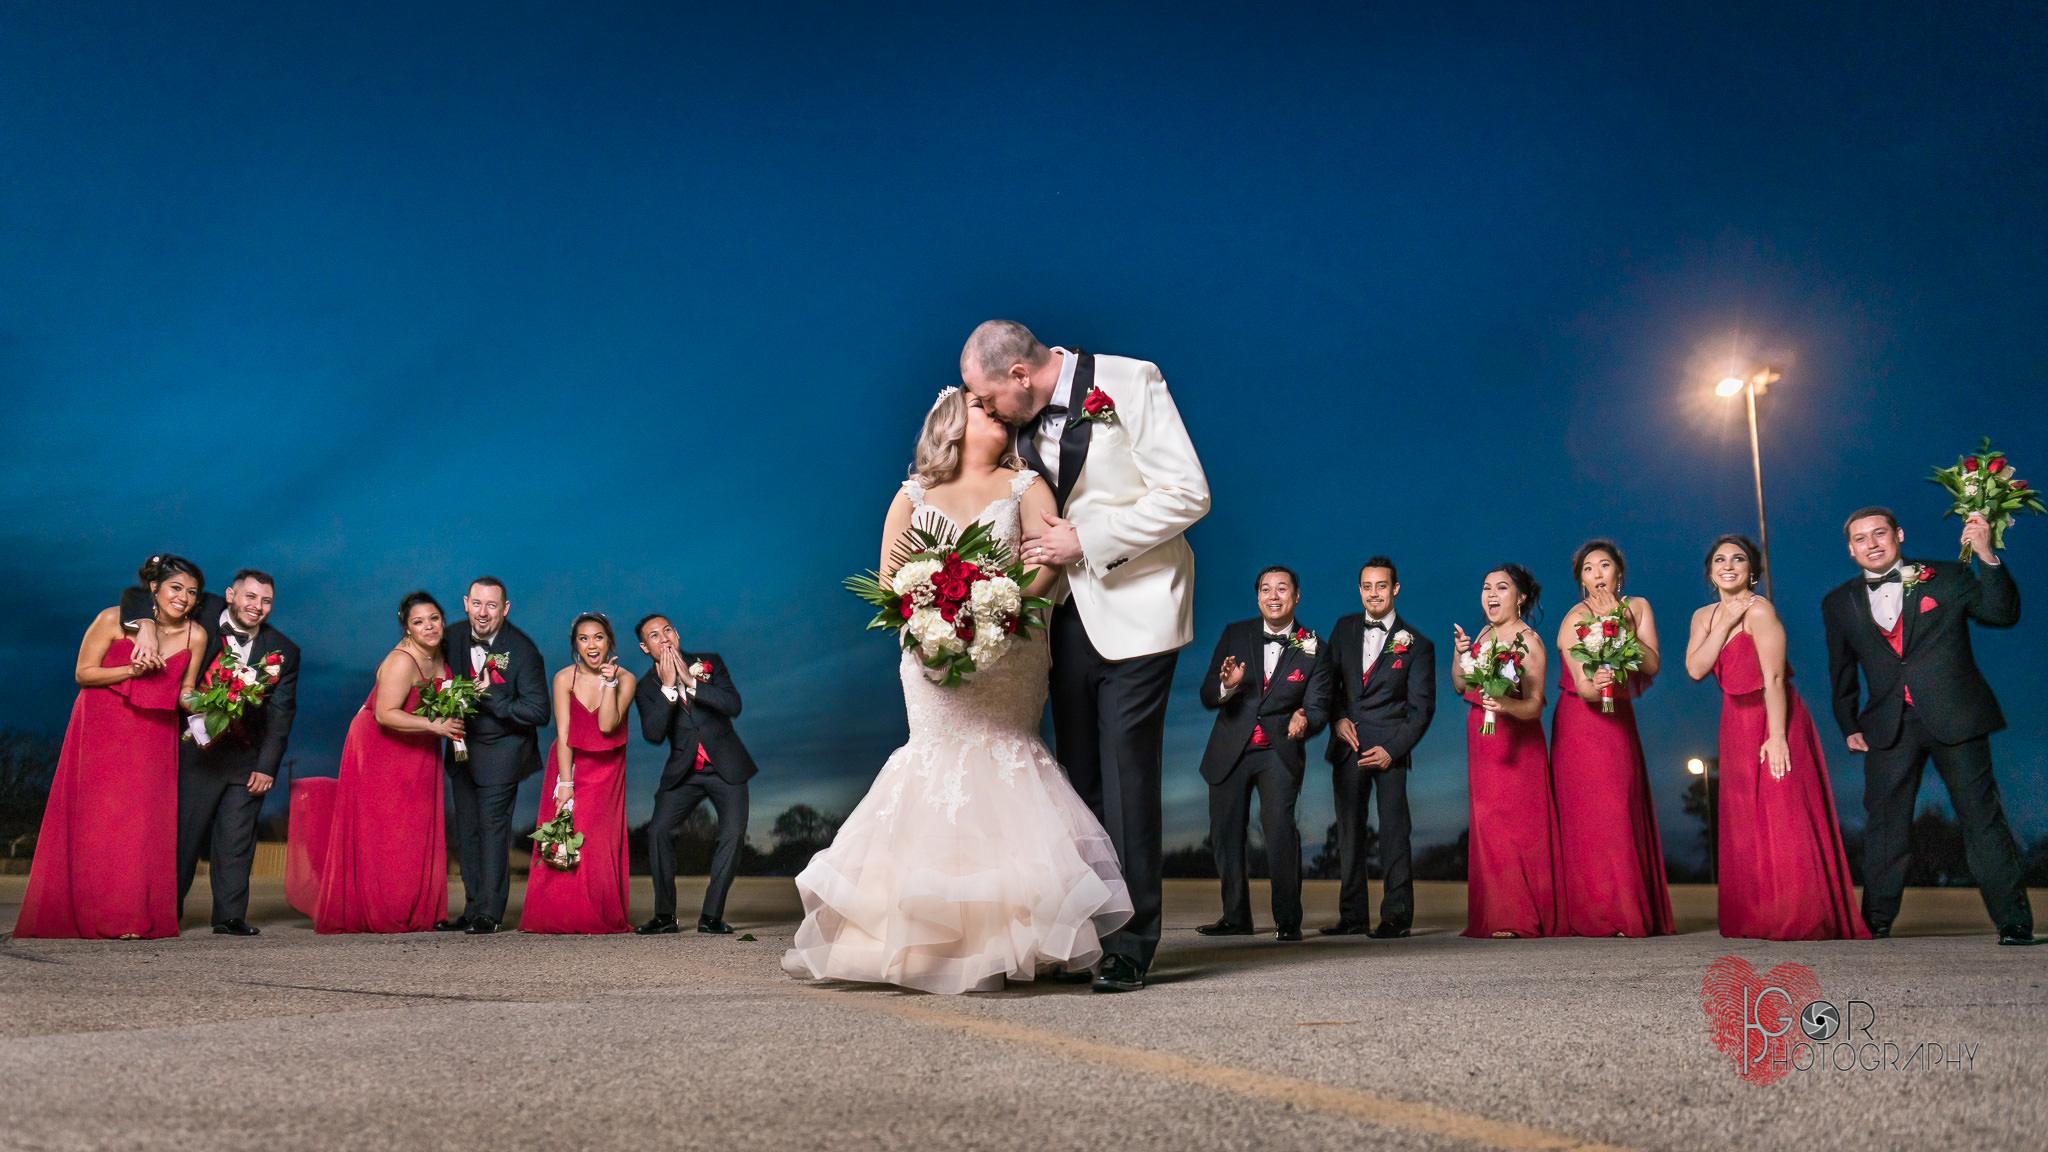 Wedding photography by Igor Photography